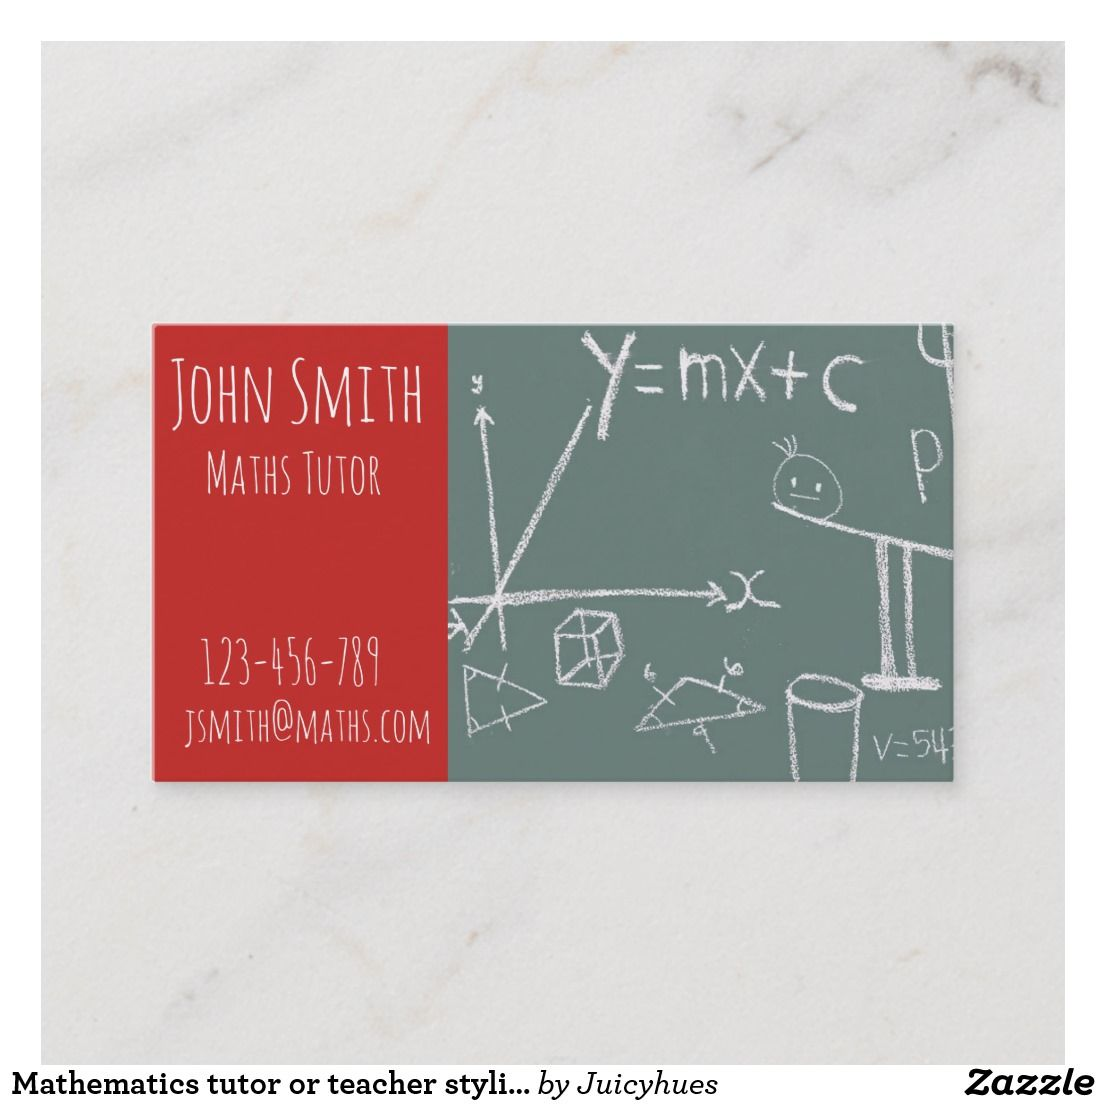 Mathematics Tutor Or Teacher Stylish Advanced Math Business Card Zazzle Com In 2021 Teacher Business Cards Graphic Design Business Card Mathematics